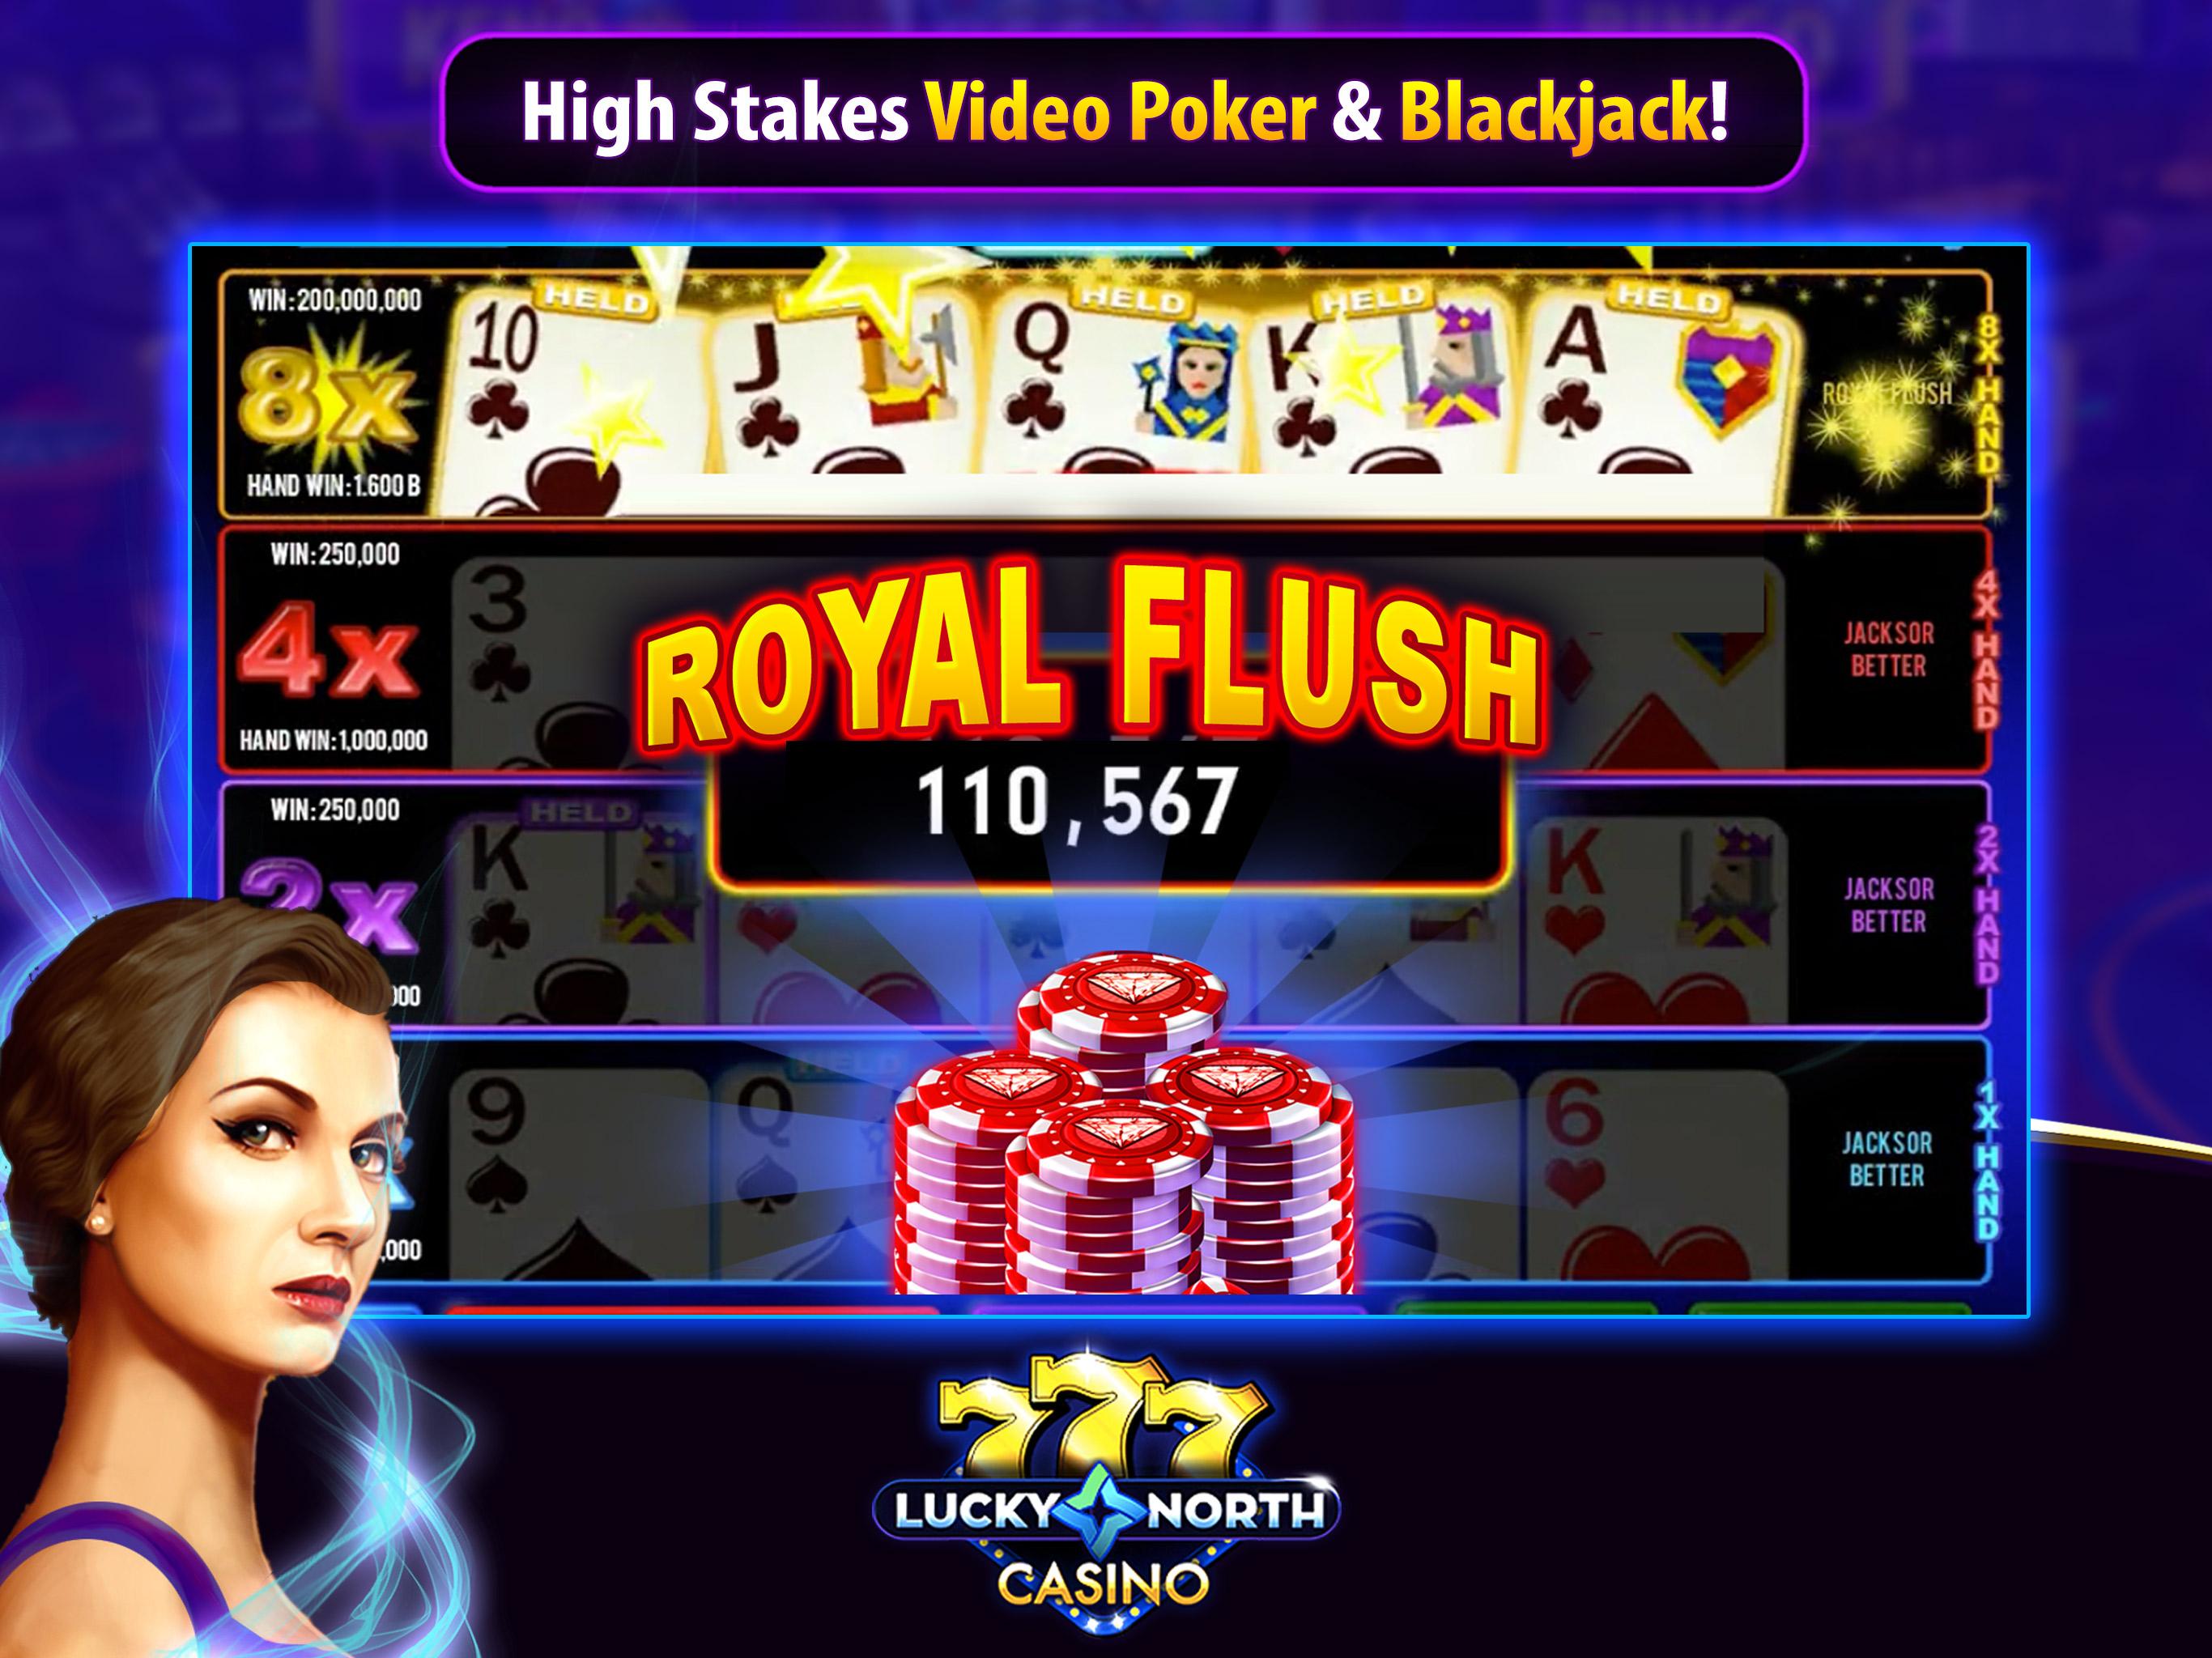 Lucky 777 Casino In Nc